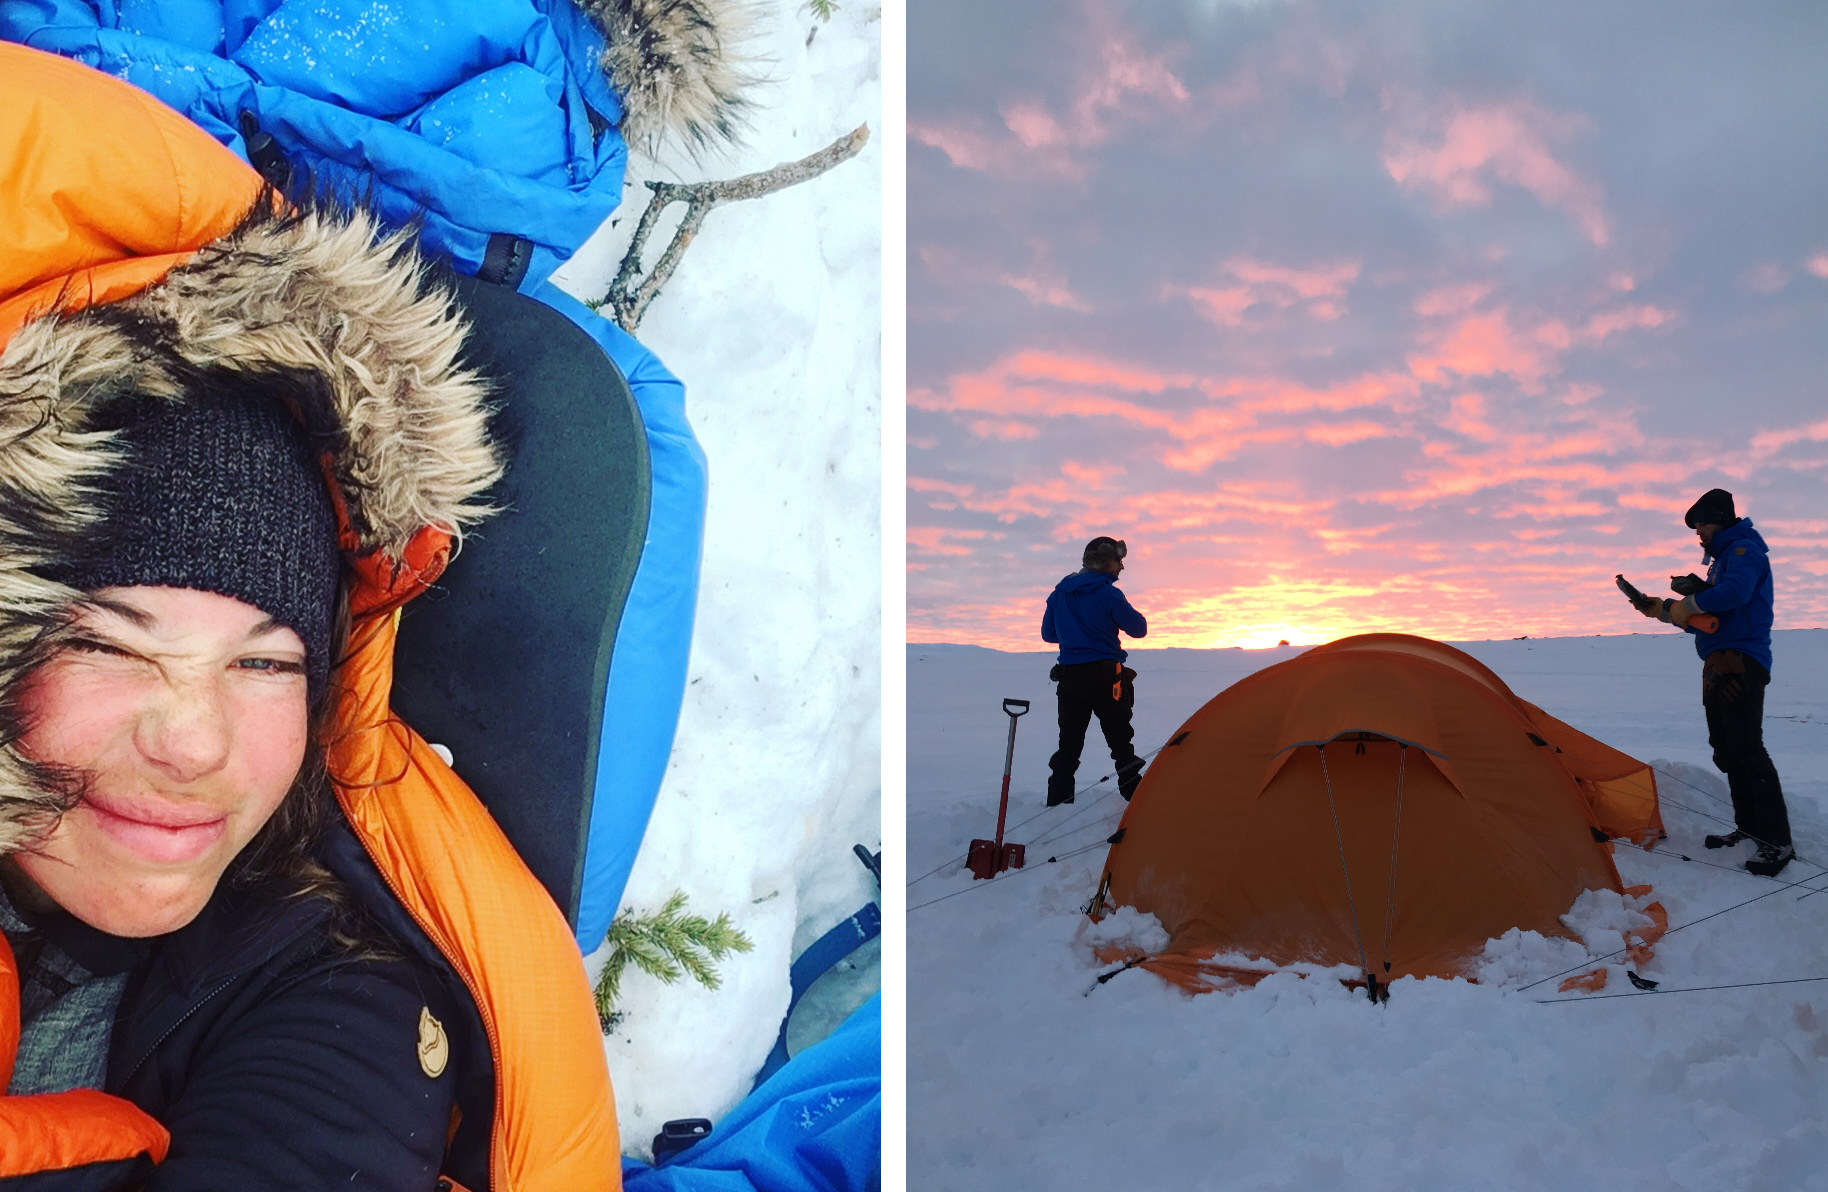 Fjällräven Polar 2019 Sian Lewis story of an Arctic adventure